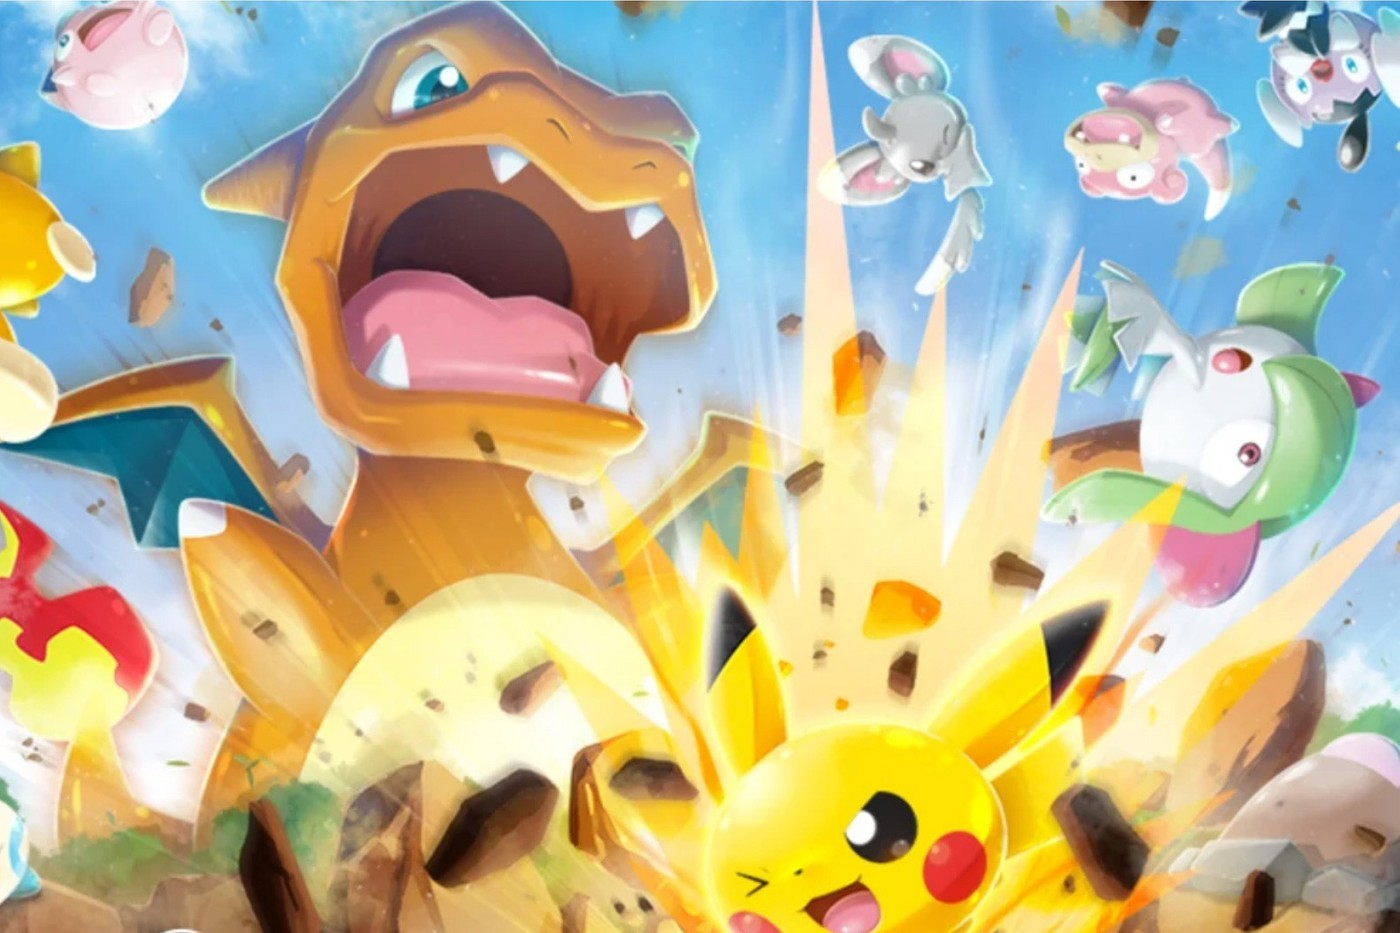 pokemon unite、Honor of Kings、The Pokémon Company、Pokémon 、Switch